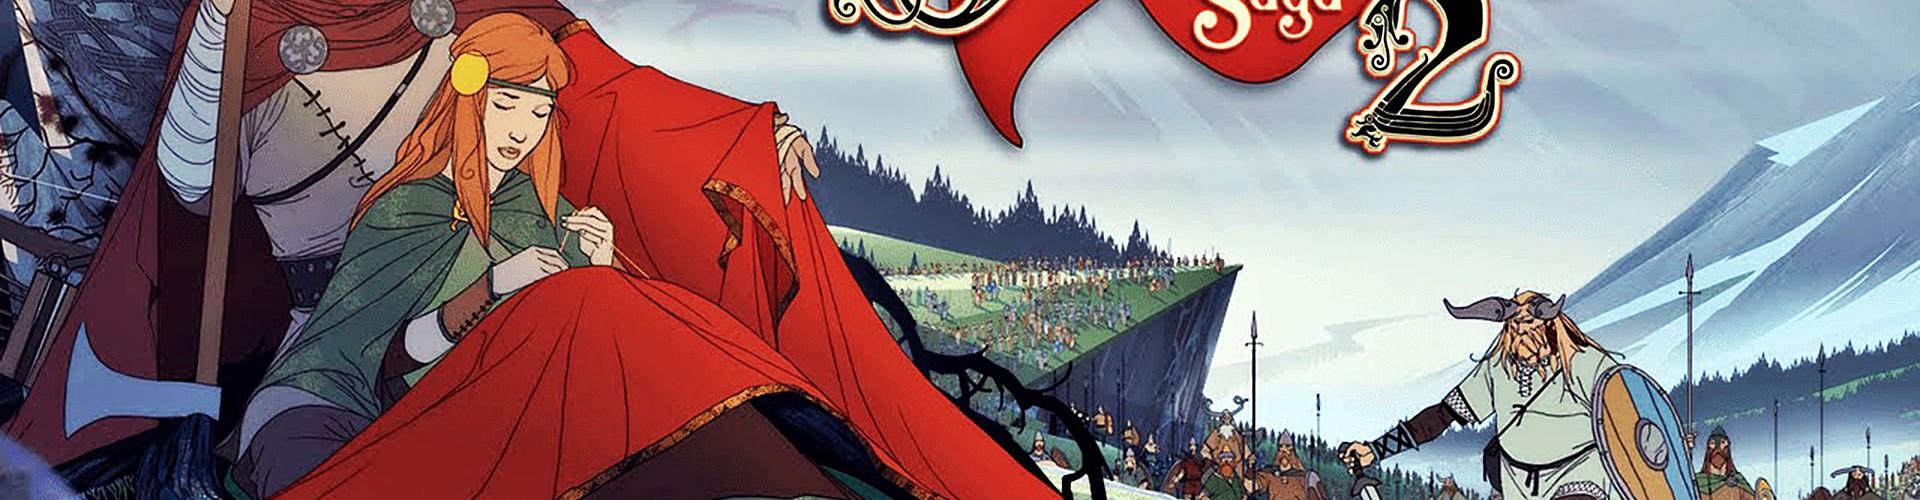 The Banner Saga 2 1080 Wallpaper 1920x500